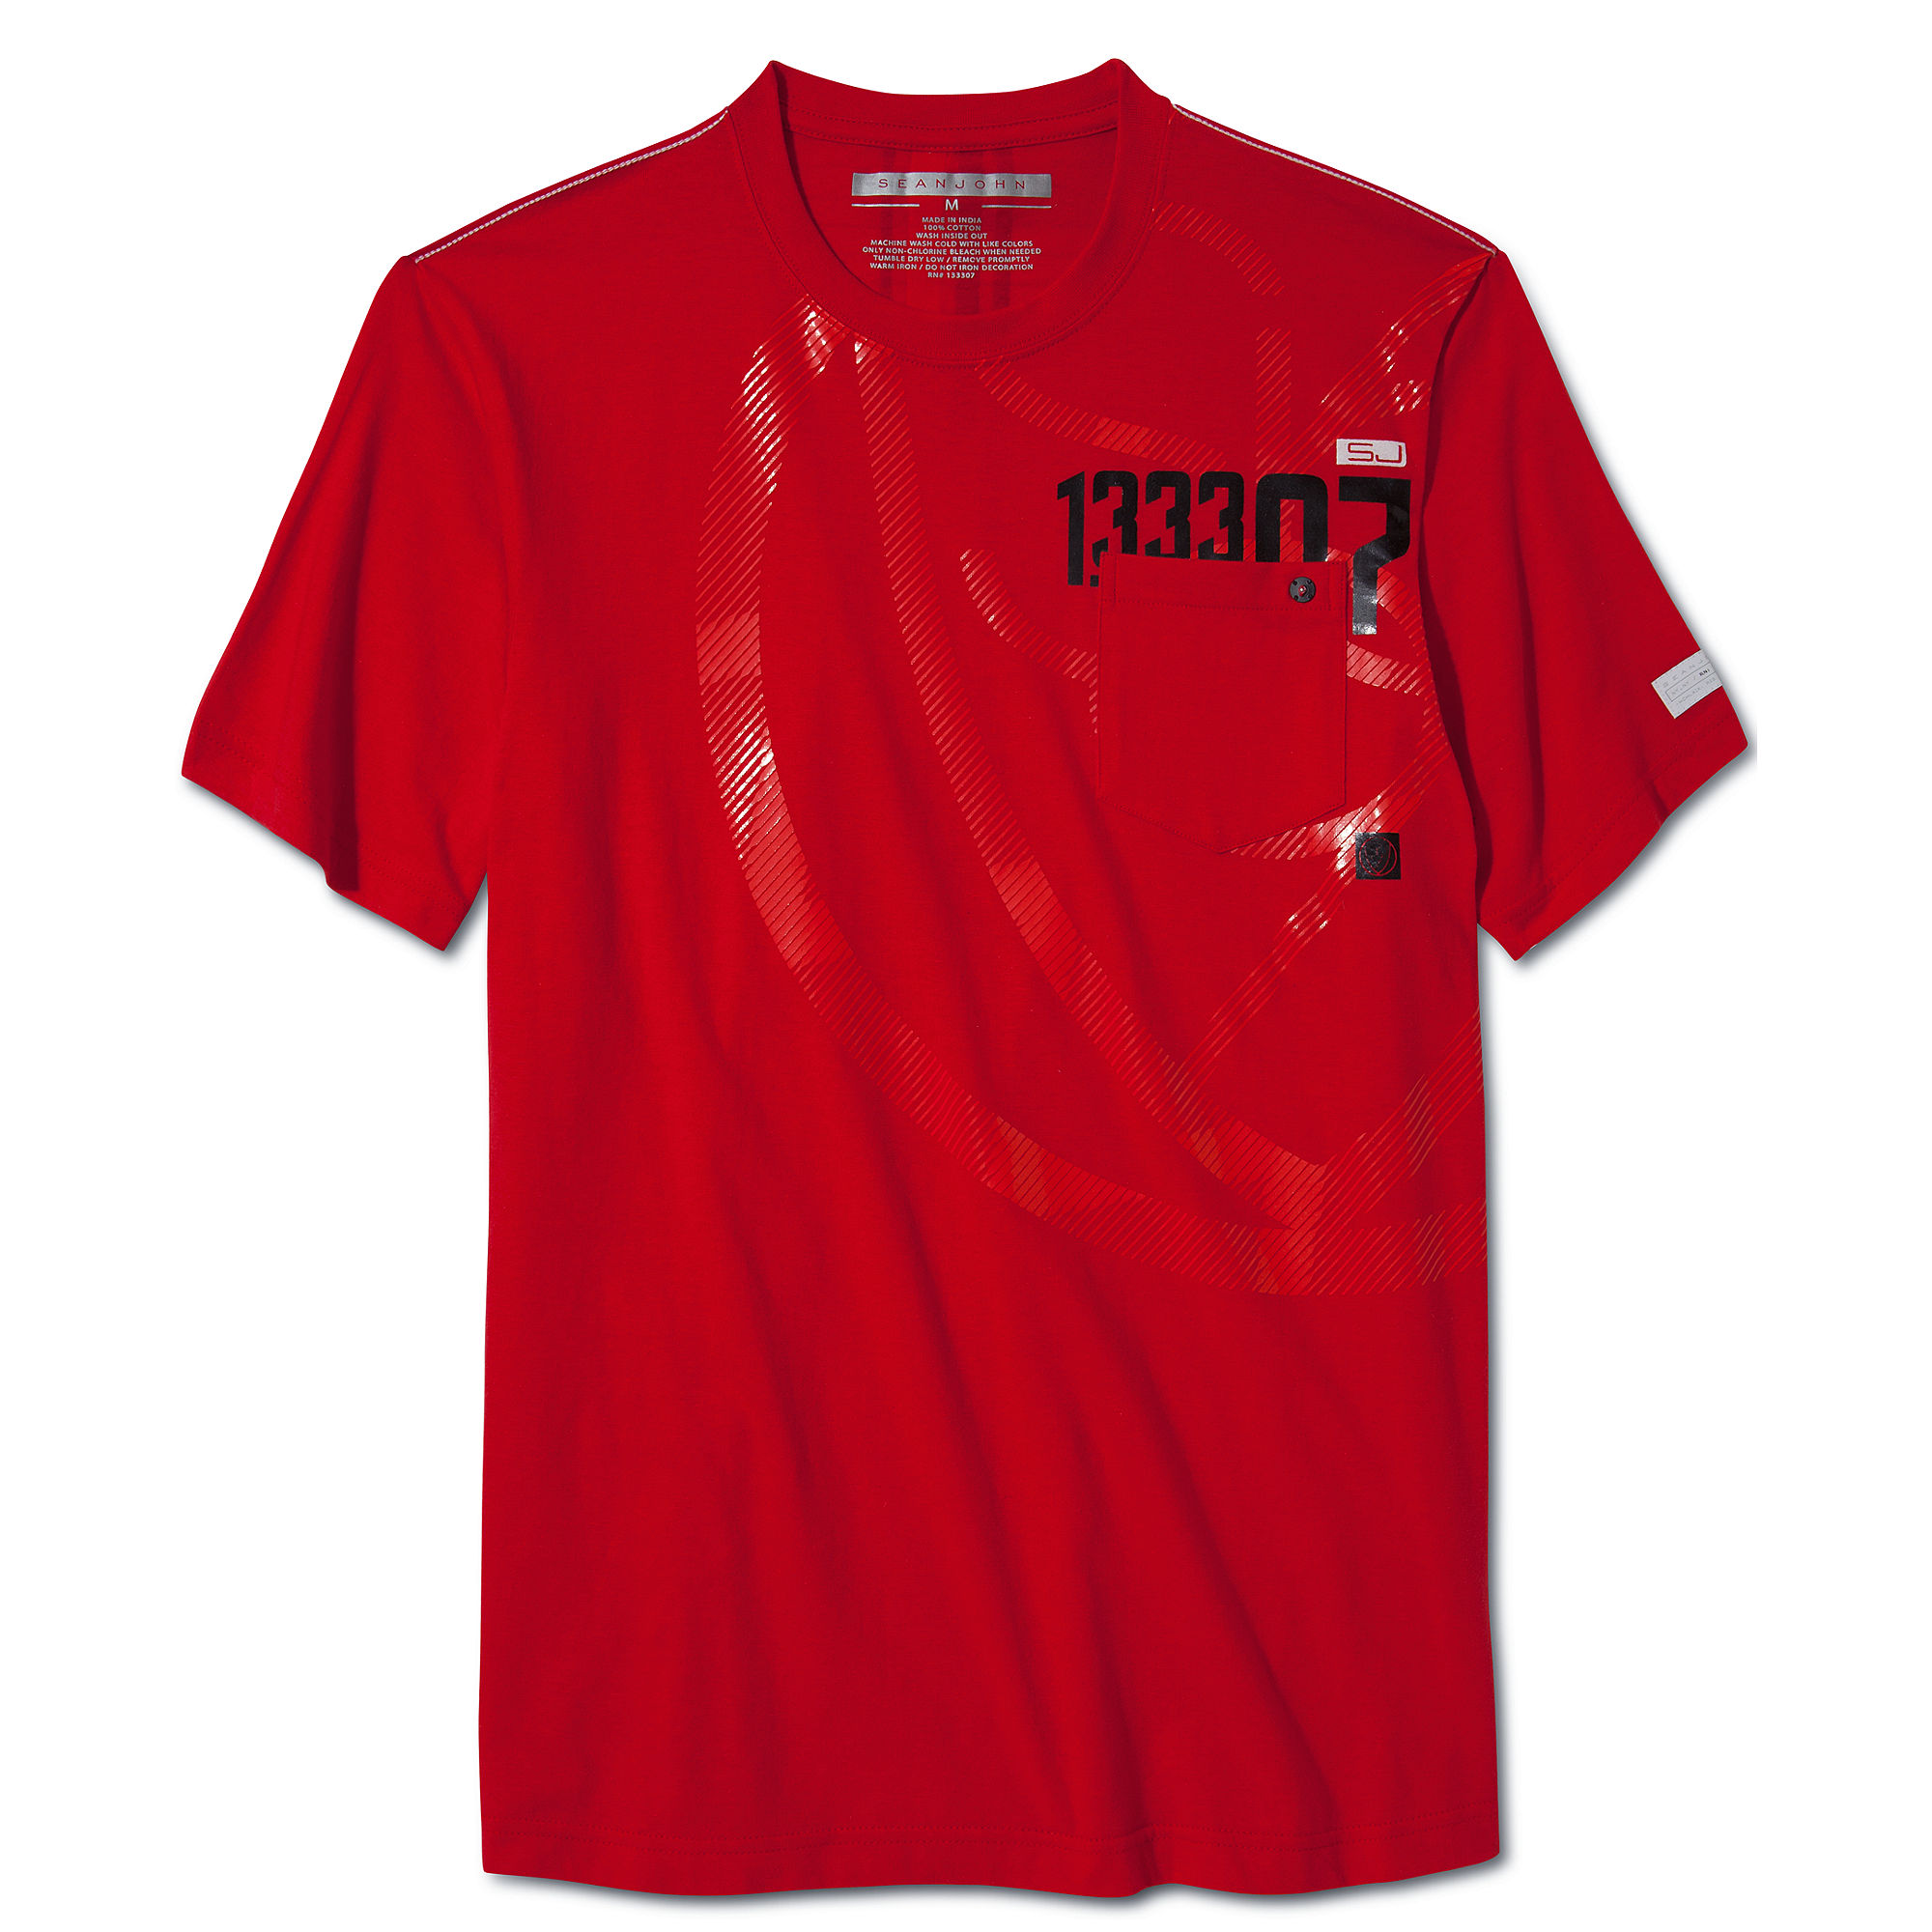 512c27d744 Lyst - Sean John Mechanic Graphic Tee in Red for Men